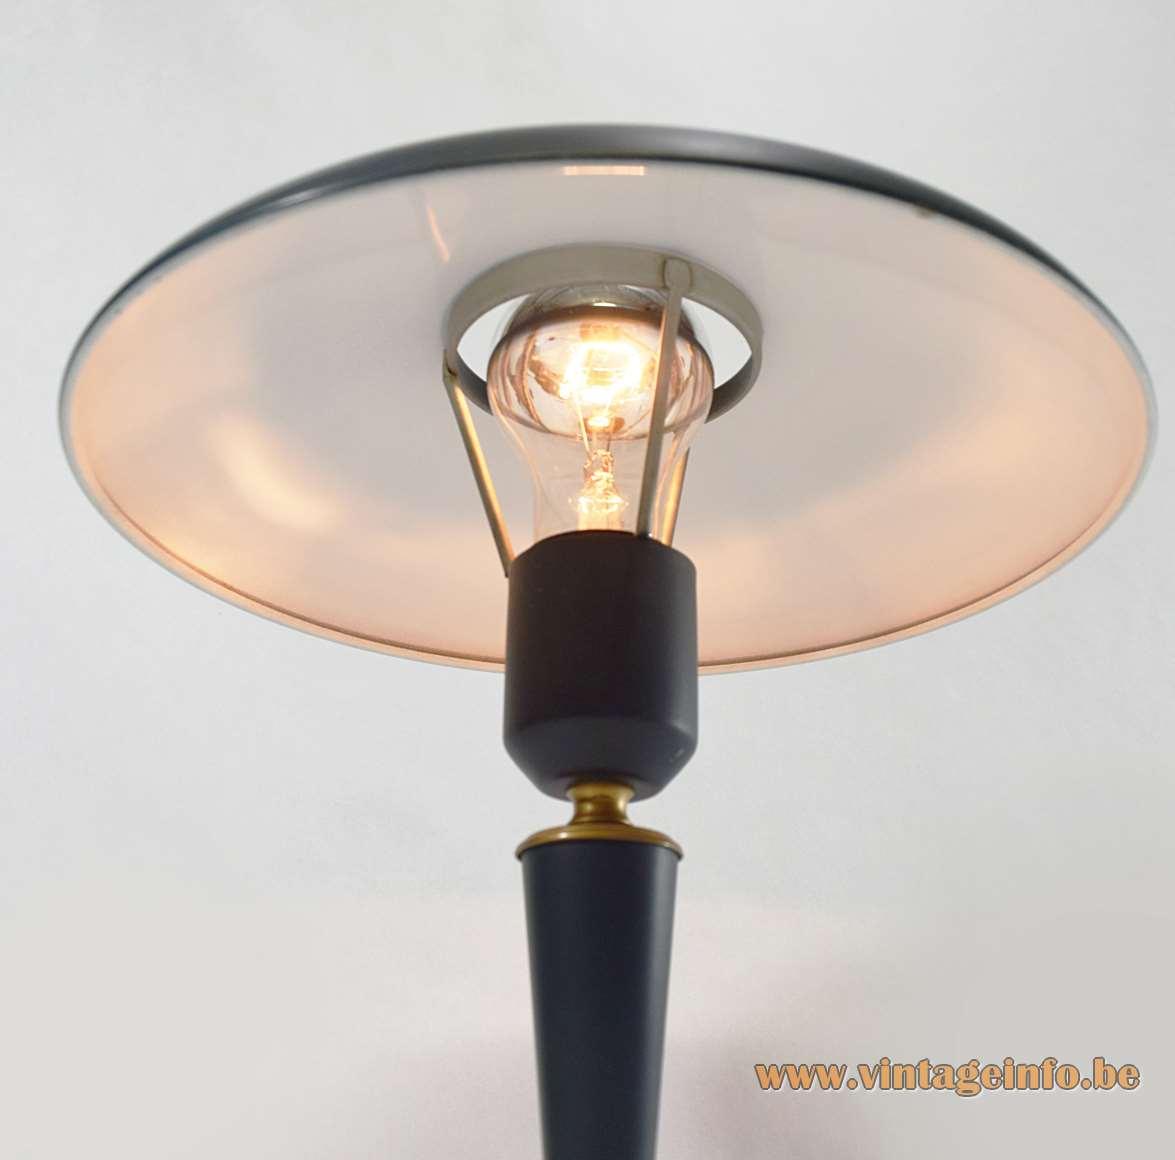 Louis Kalff desk or table lamp Bijou green mushroom lampshade tripod base Philips E27 socket 1950s 1960s MCM Mid-Century Modern